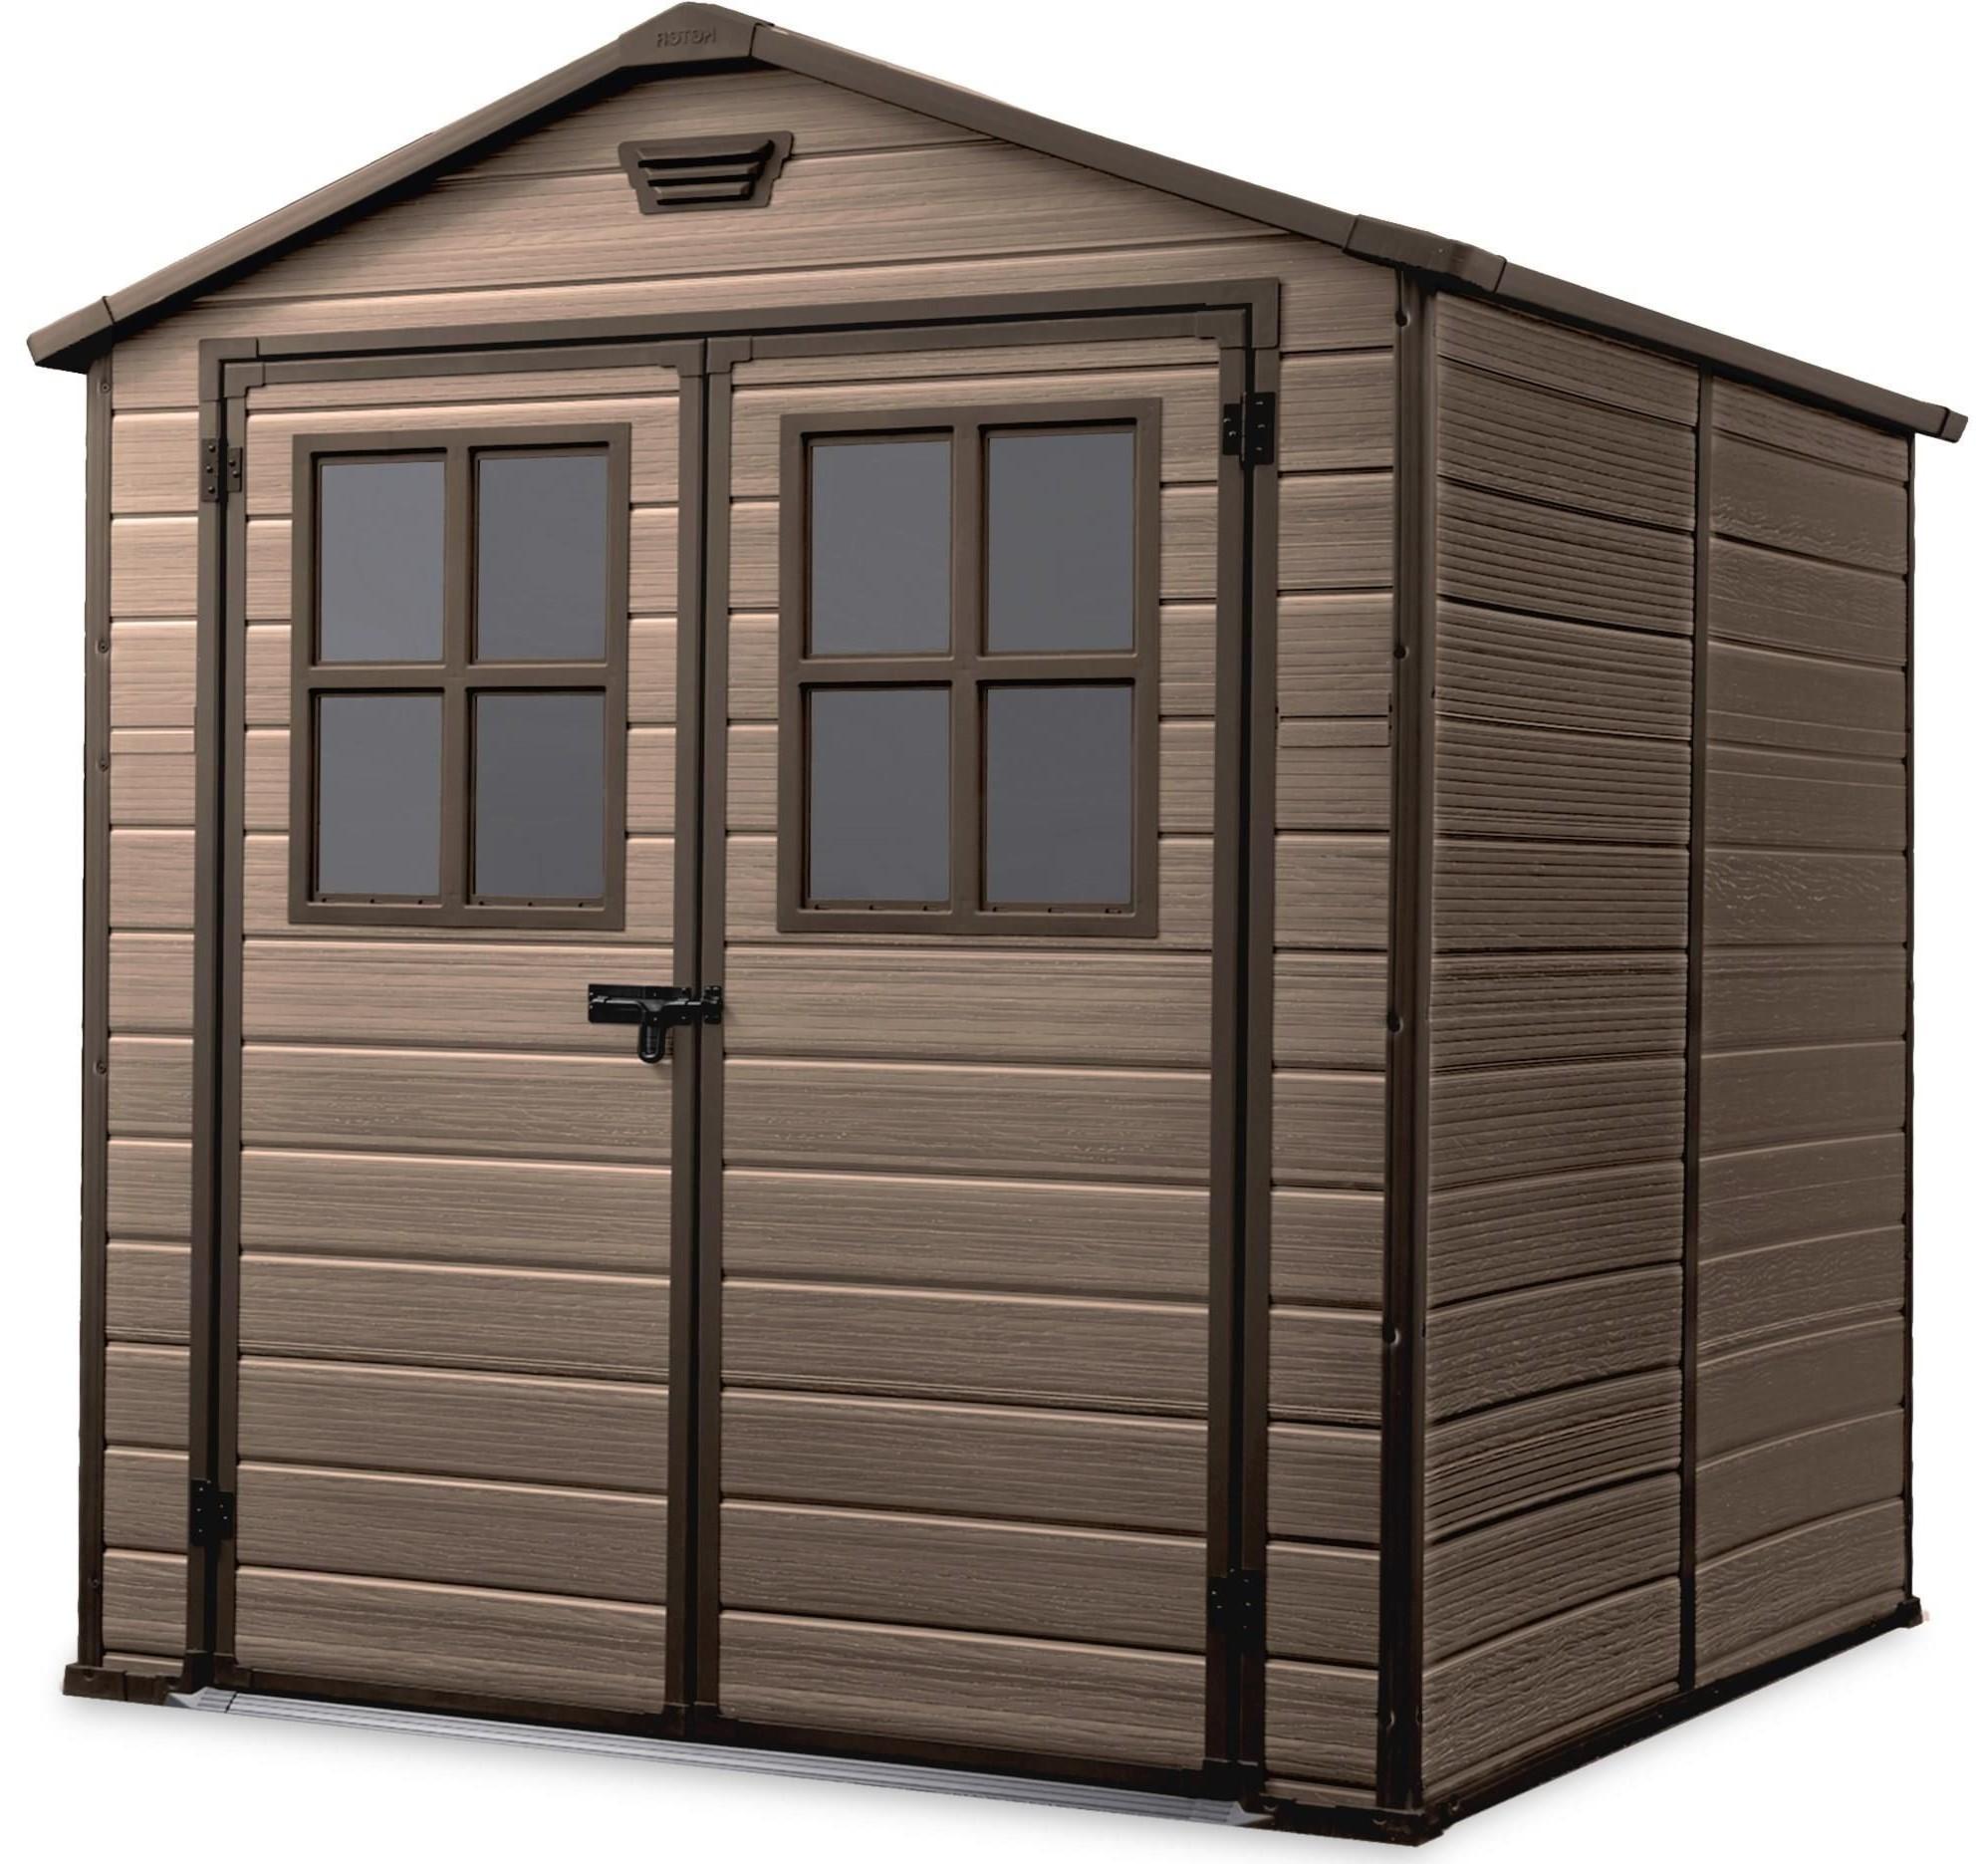 KETER Zahradní domek Keter SCALA 6x8 s okny 17202394